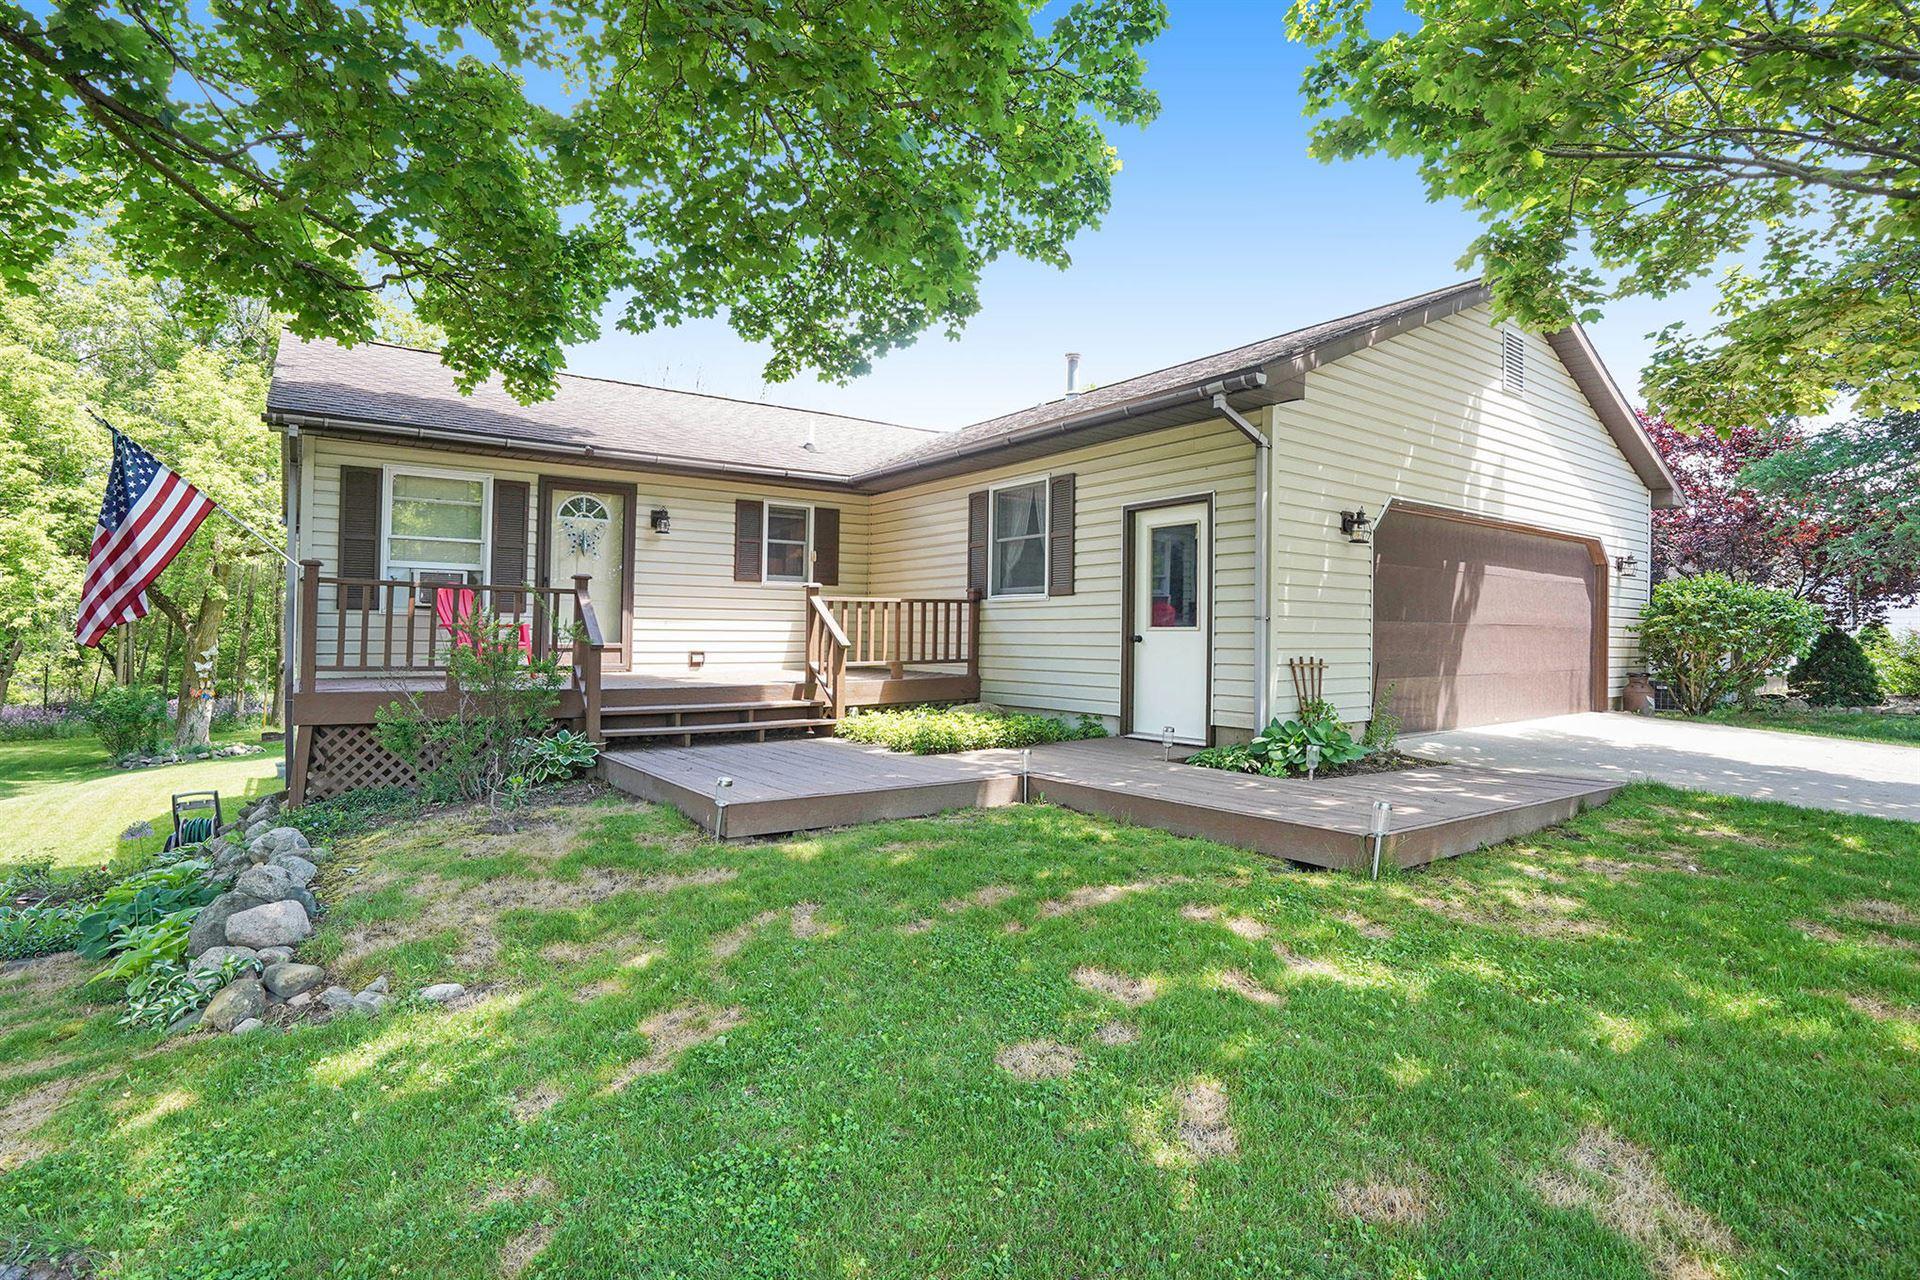 518 N Division Avenue, Fremont, MI 49412 - MLS#: 21020358